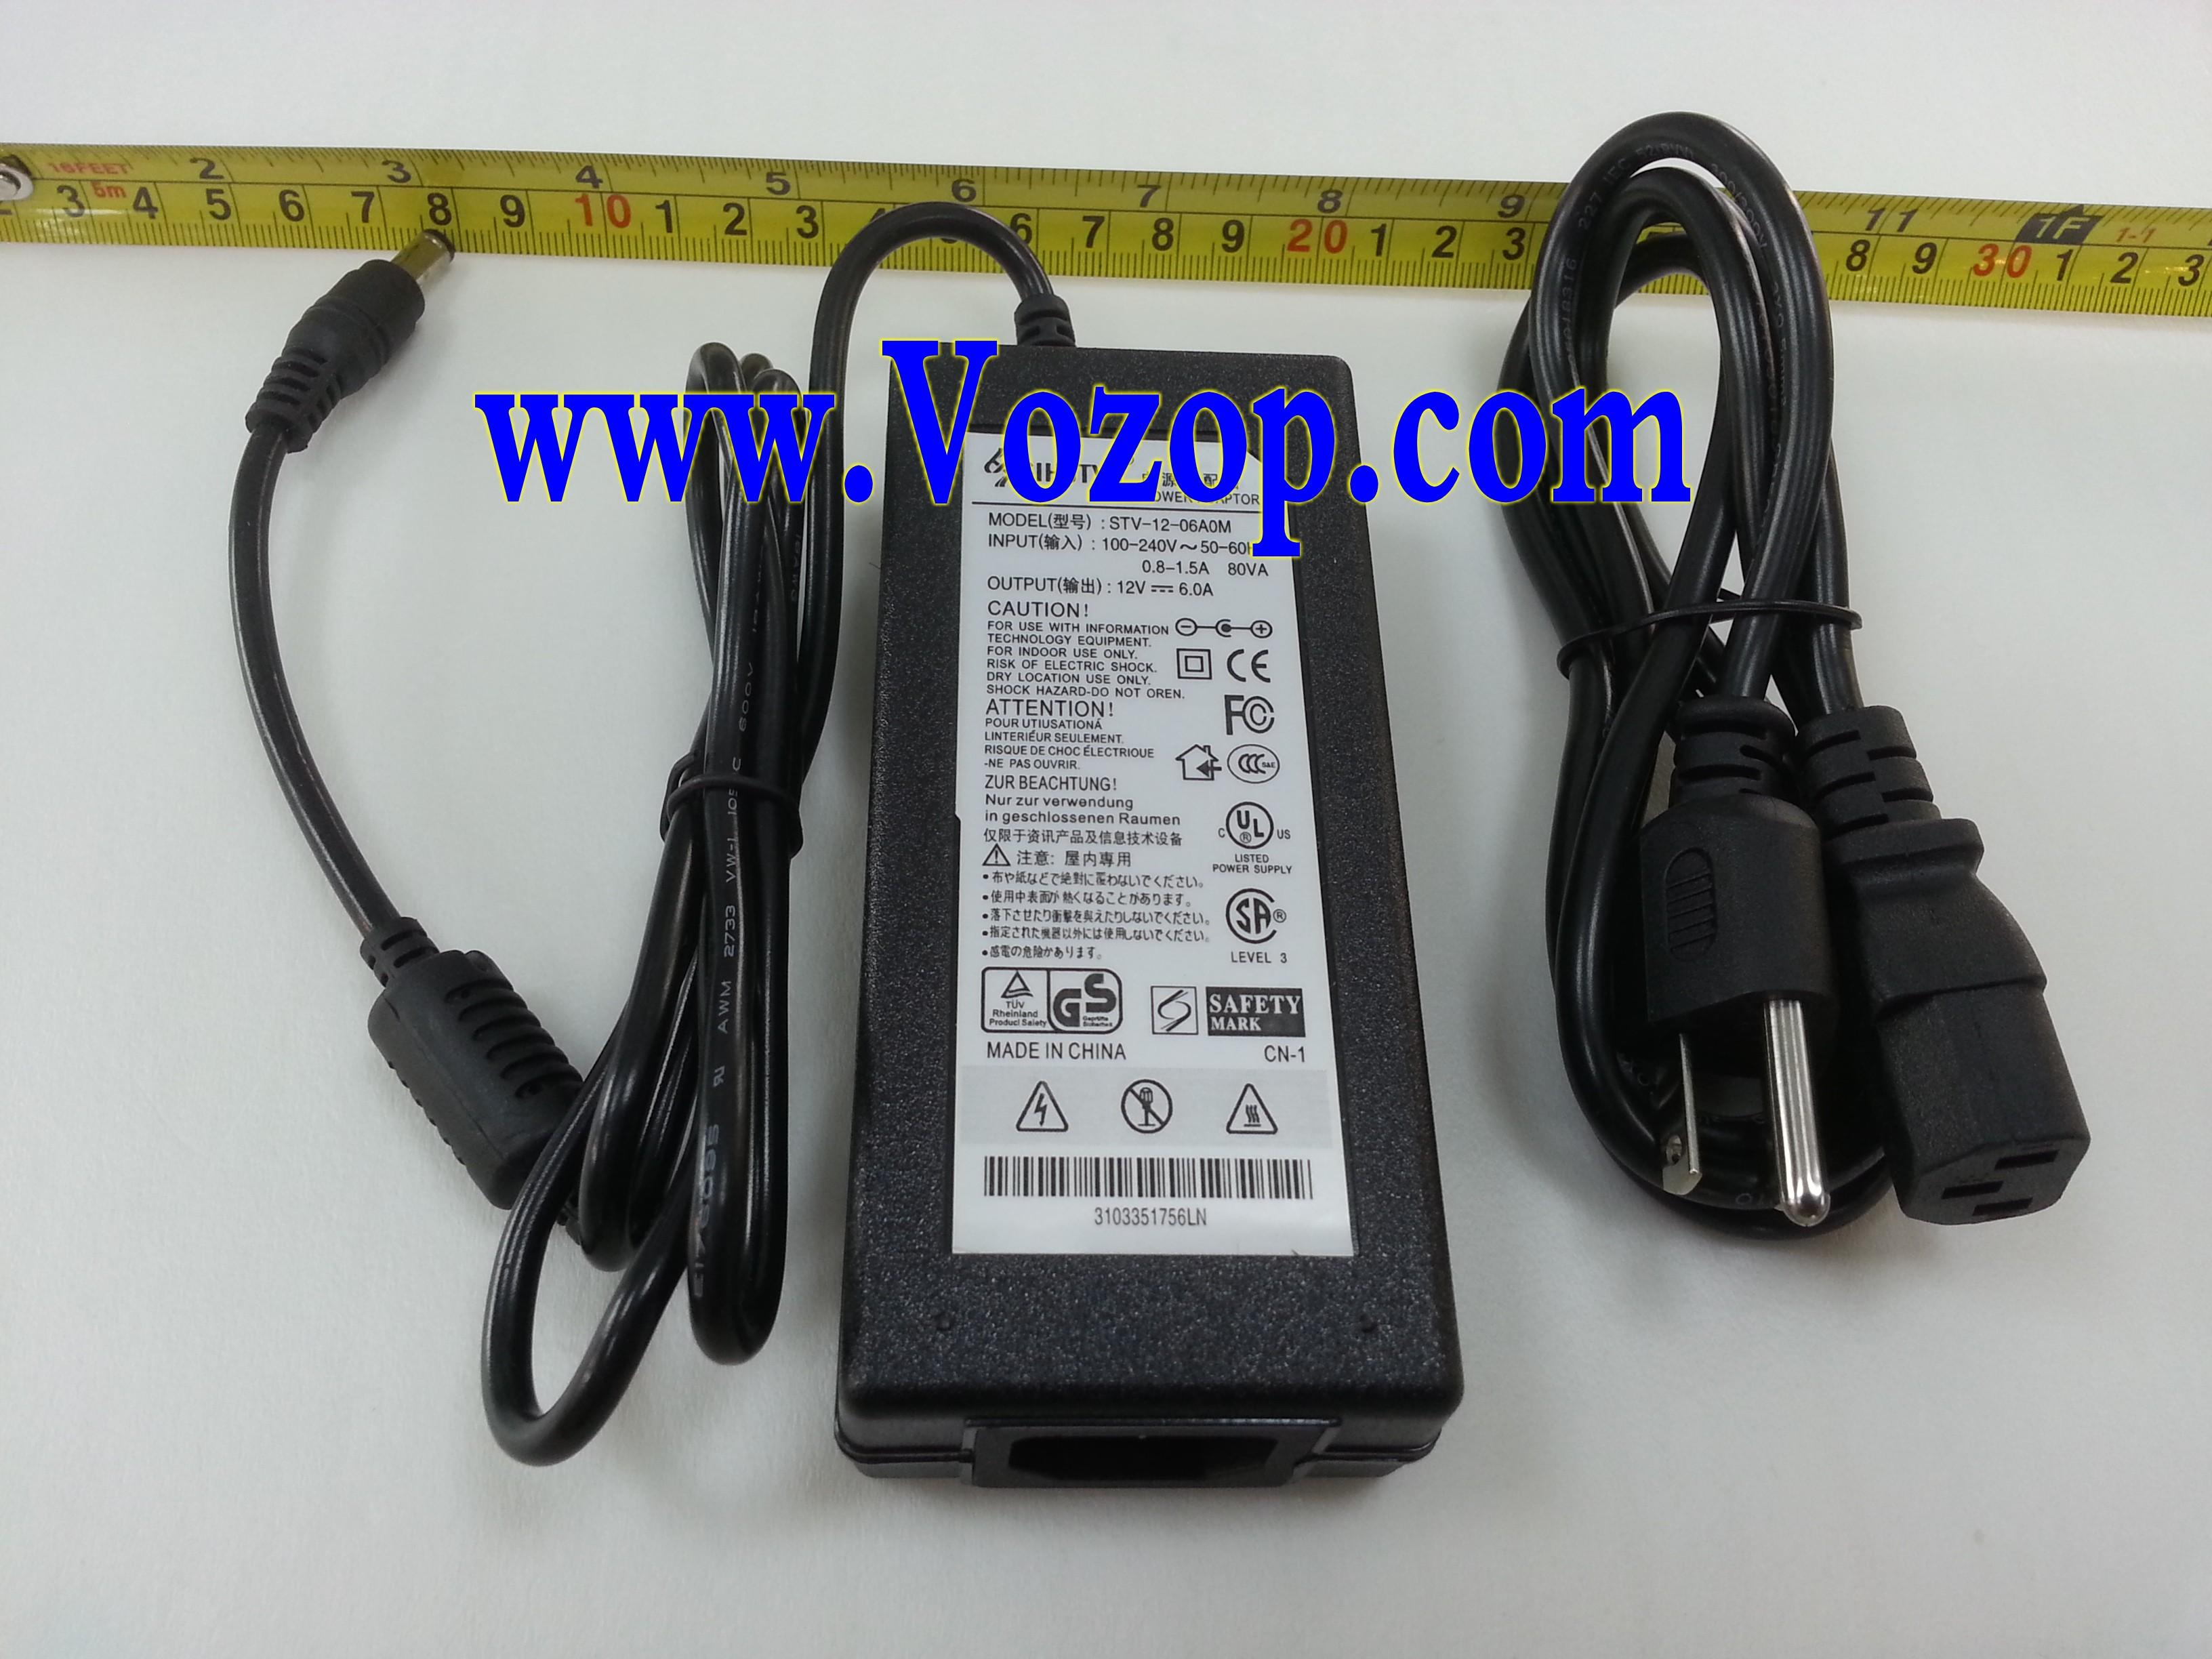 DC_12V_6A_72W_Power_Supply_Driver_AC_to_DC_Power_Transverter